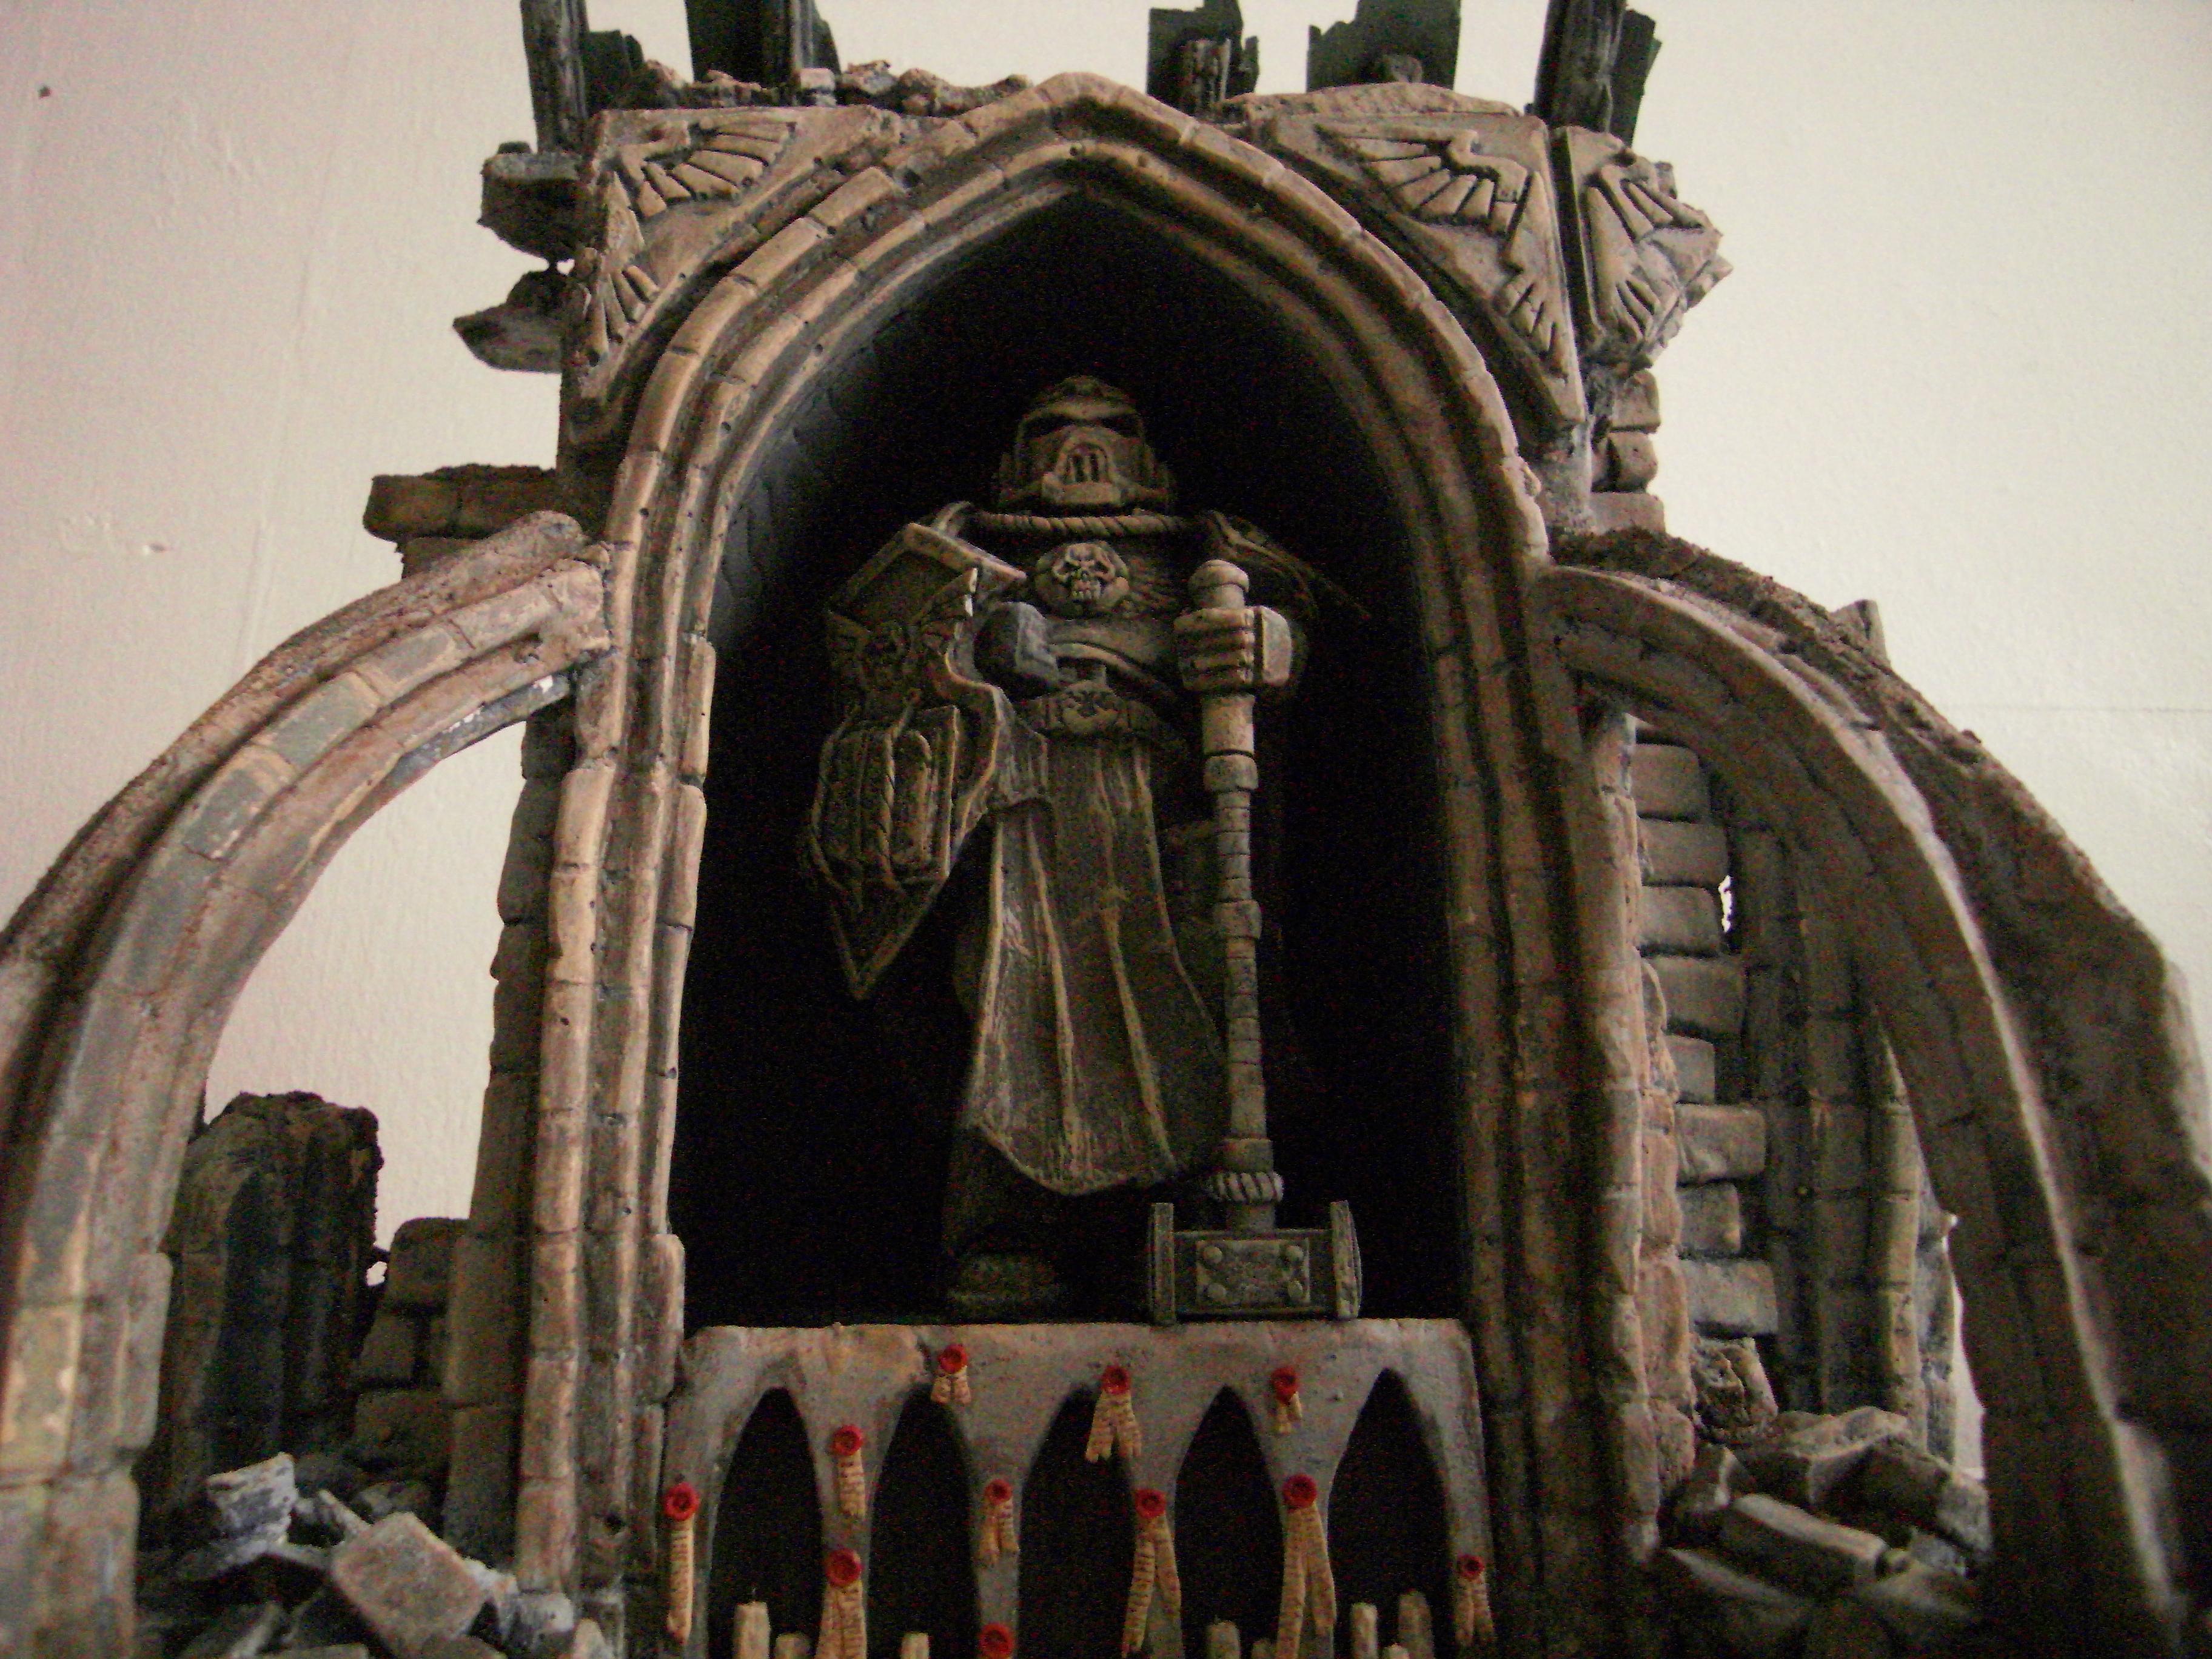 Cathedral, Ruin, Shrine, Space Marines, Statue, Terrain, Warhammer 40,000, Warhammer Fantasy